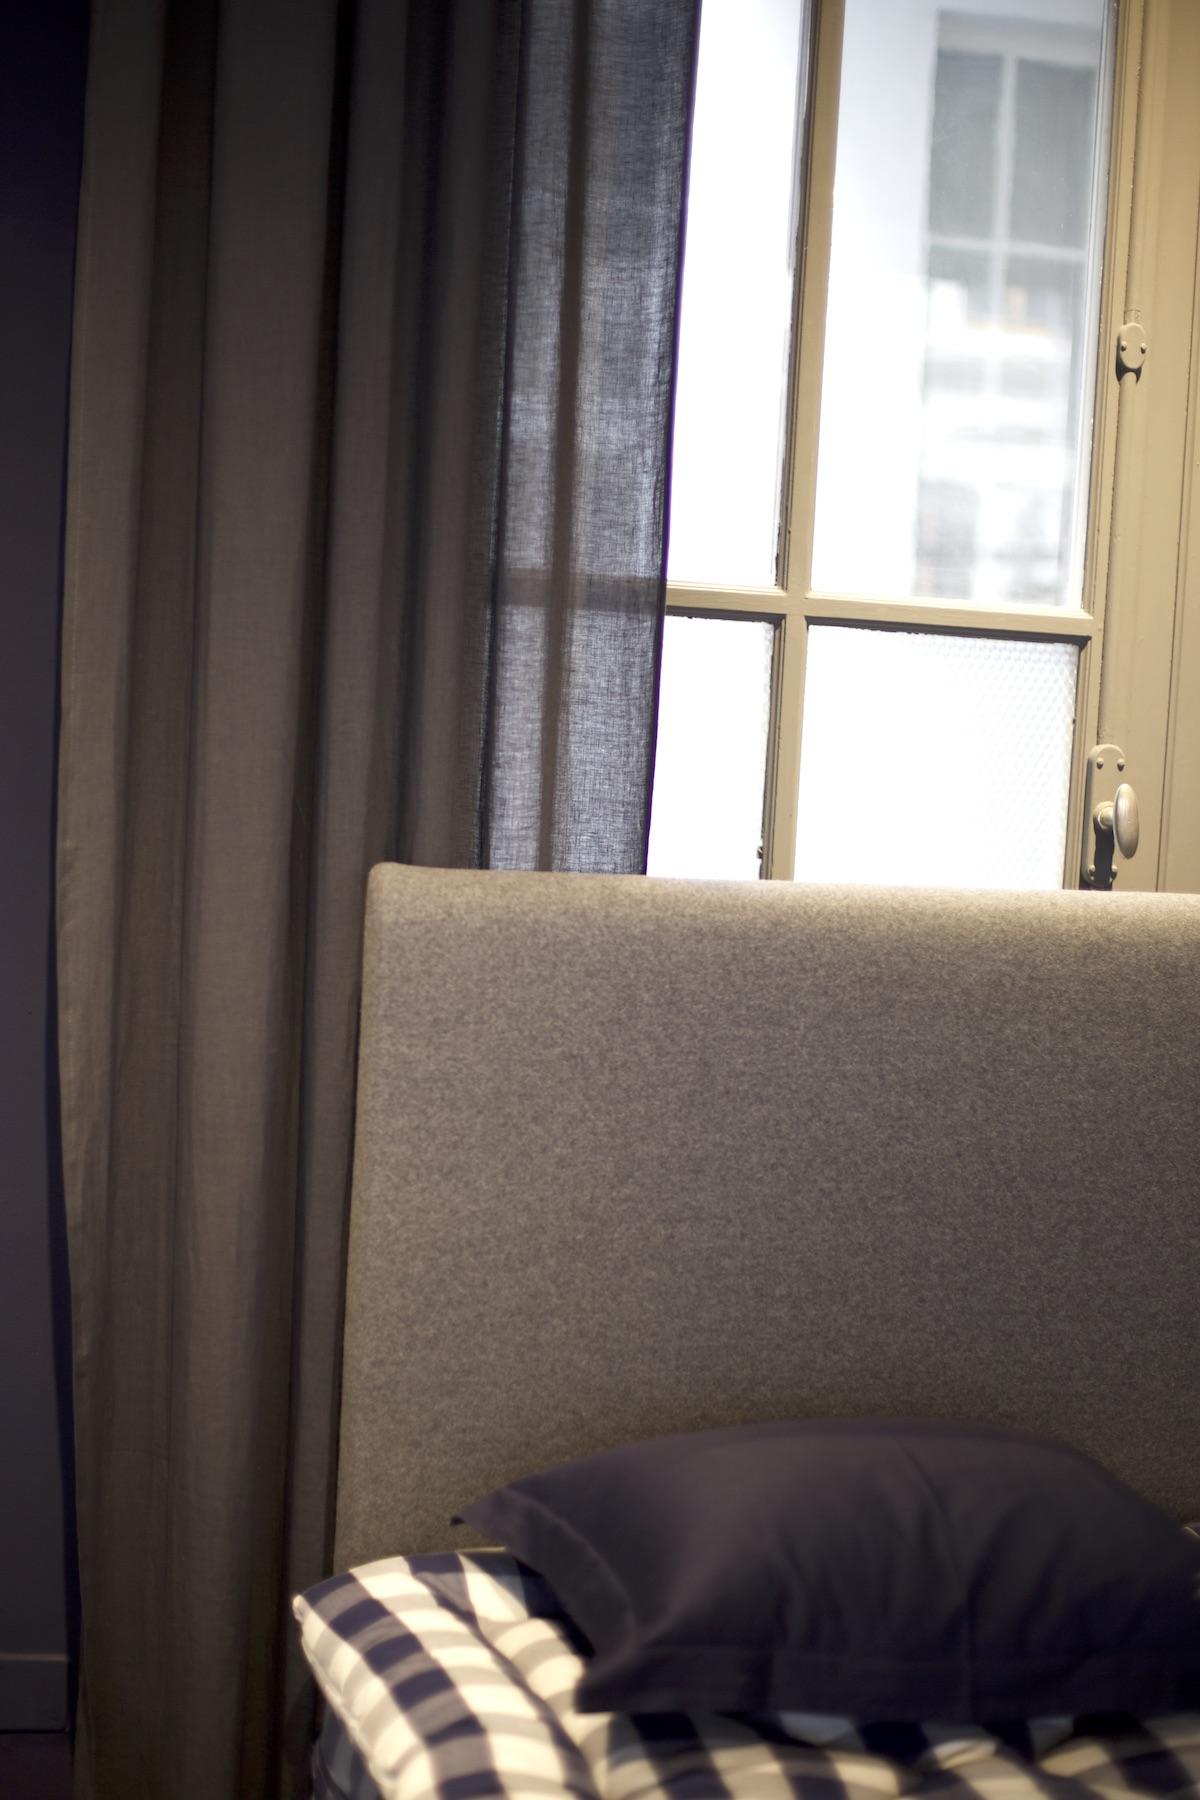 EALA - 180x210 cmBJX Luxury, med-firmSALE Preis CHF 16'176.00Originalpreis CHF 20'220.00_EALA Blue Check Anniversary180x210 cmBJ, med-firmSALE Preis CHF 17'701.00Originalpreis CHF 19'668.00